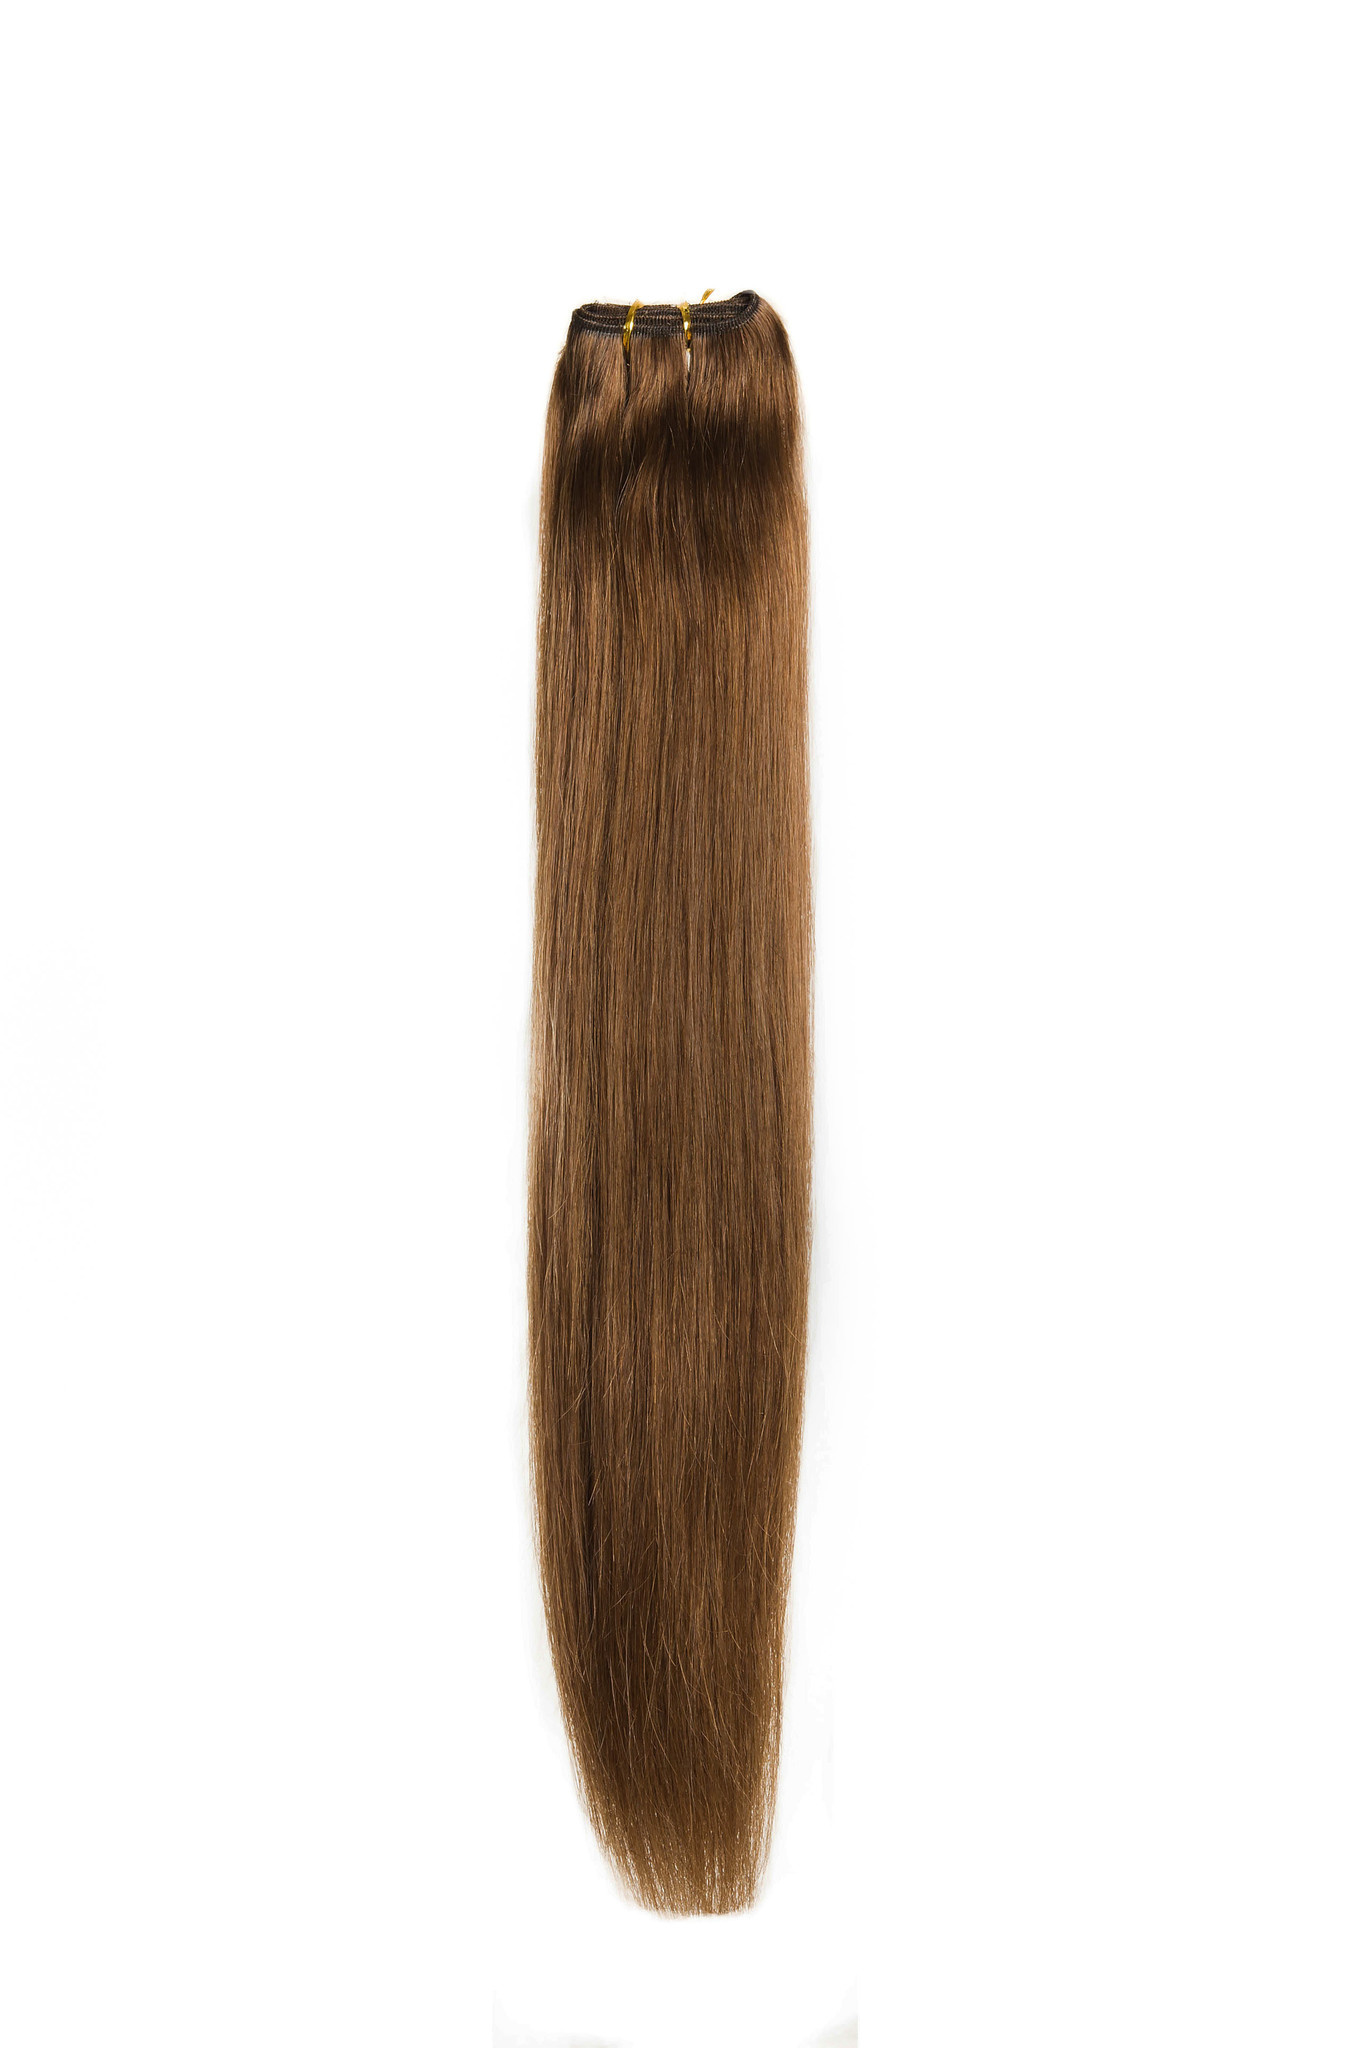 RedFox Weave - #22 Hollywood Blonde